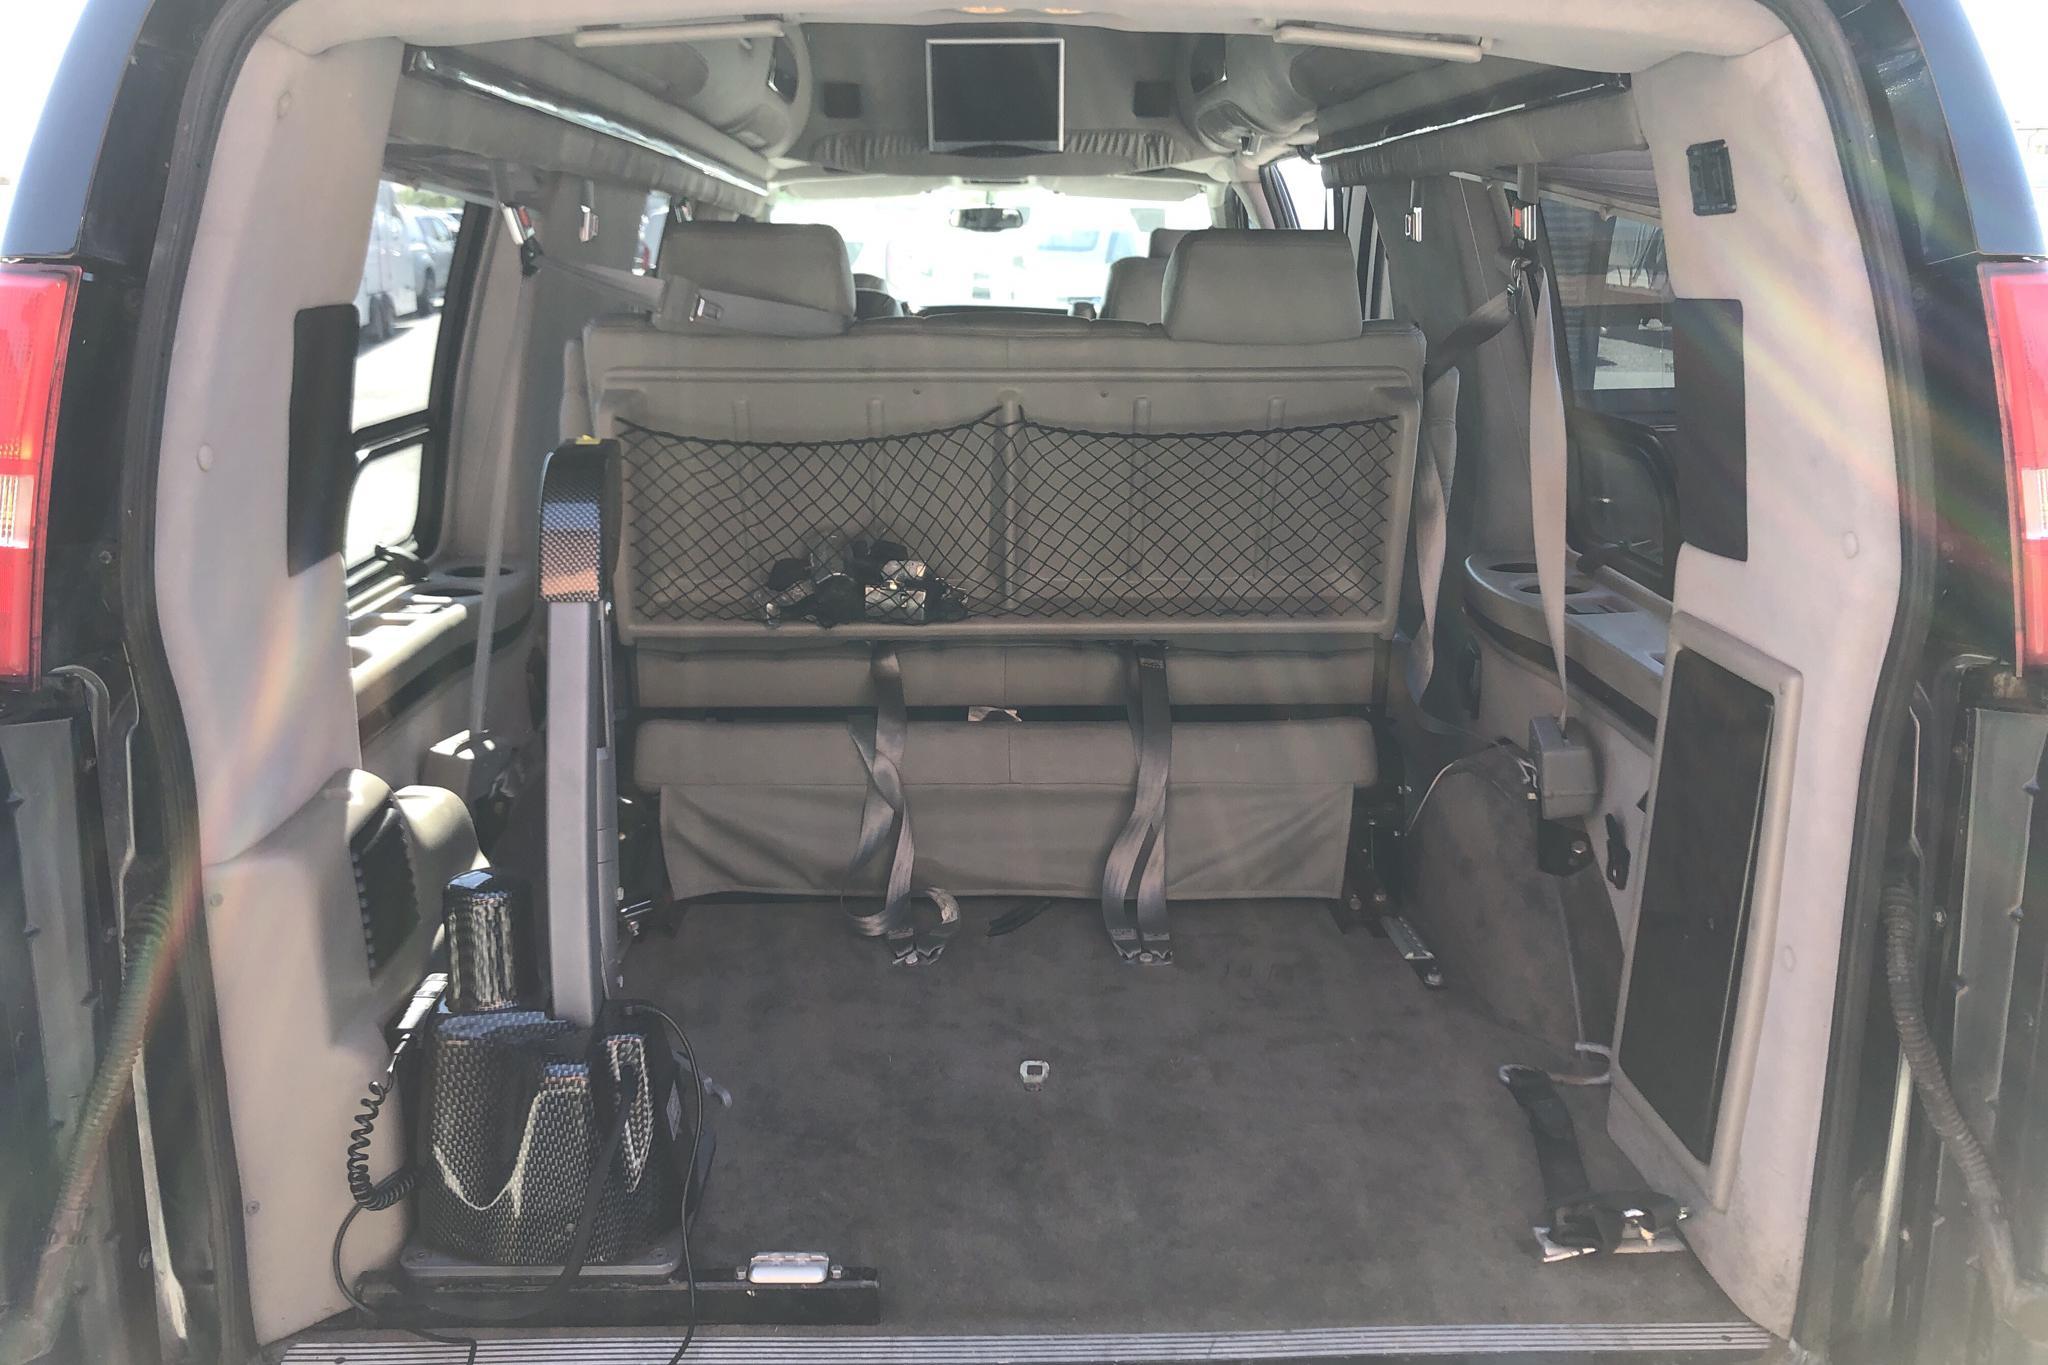 Chevrolet Express G2500 (350hk) - 4 191 mil - Automat - Dark Blue - 2006